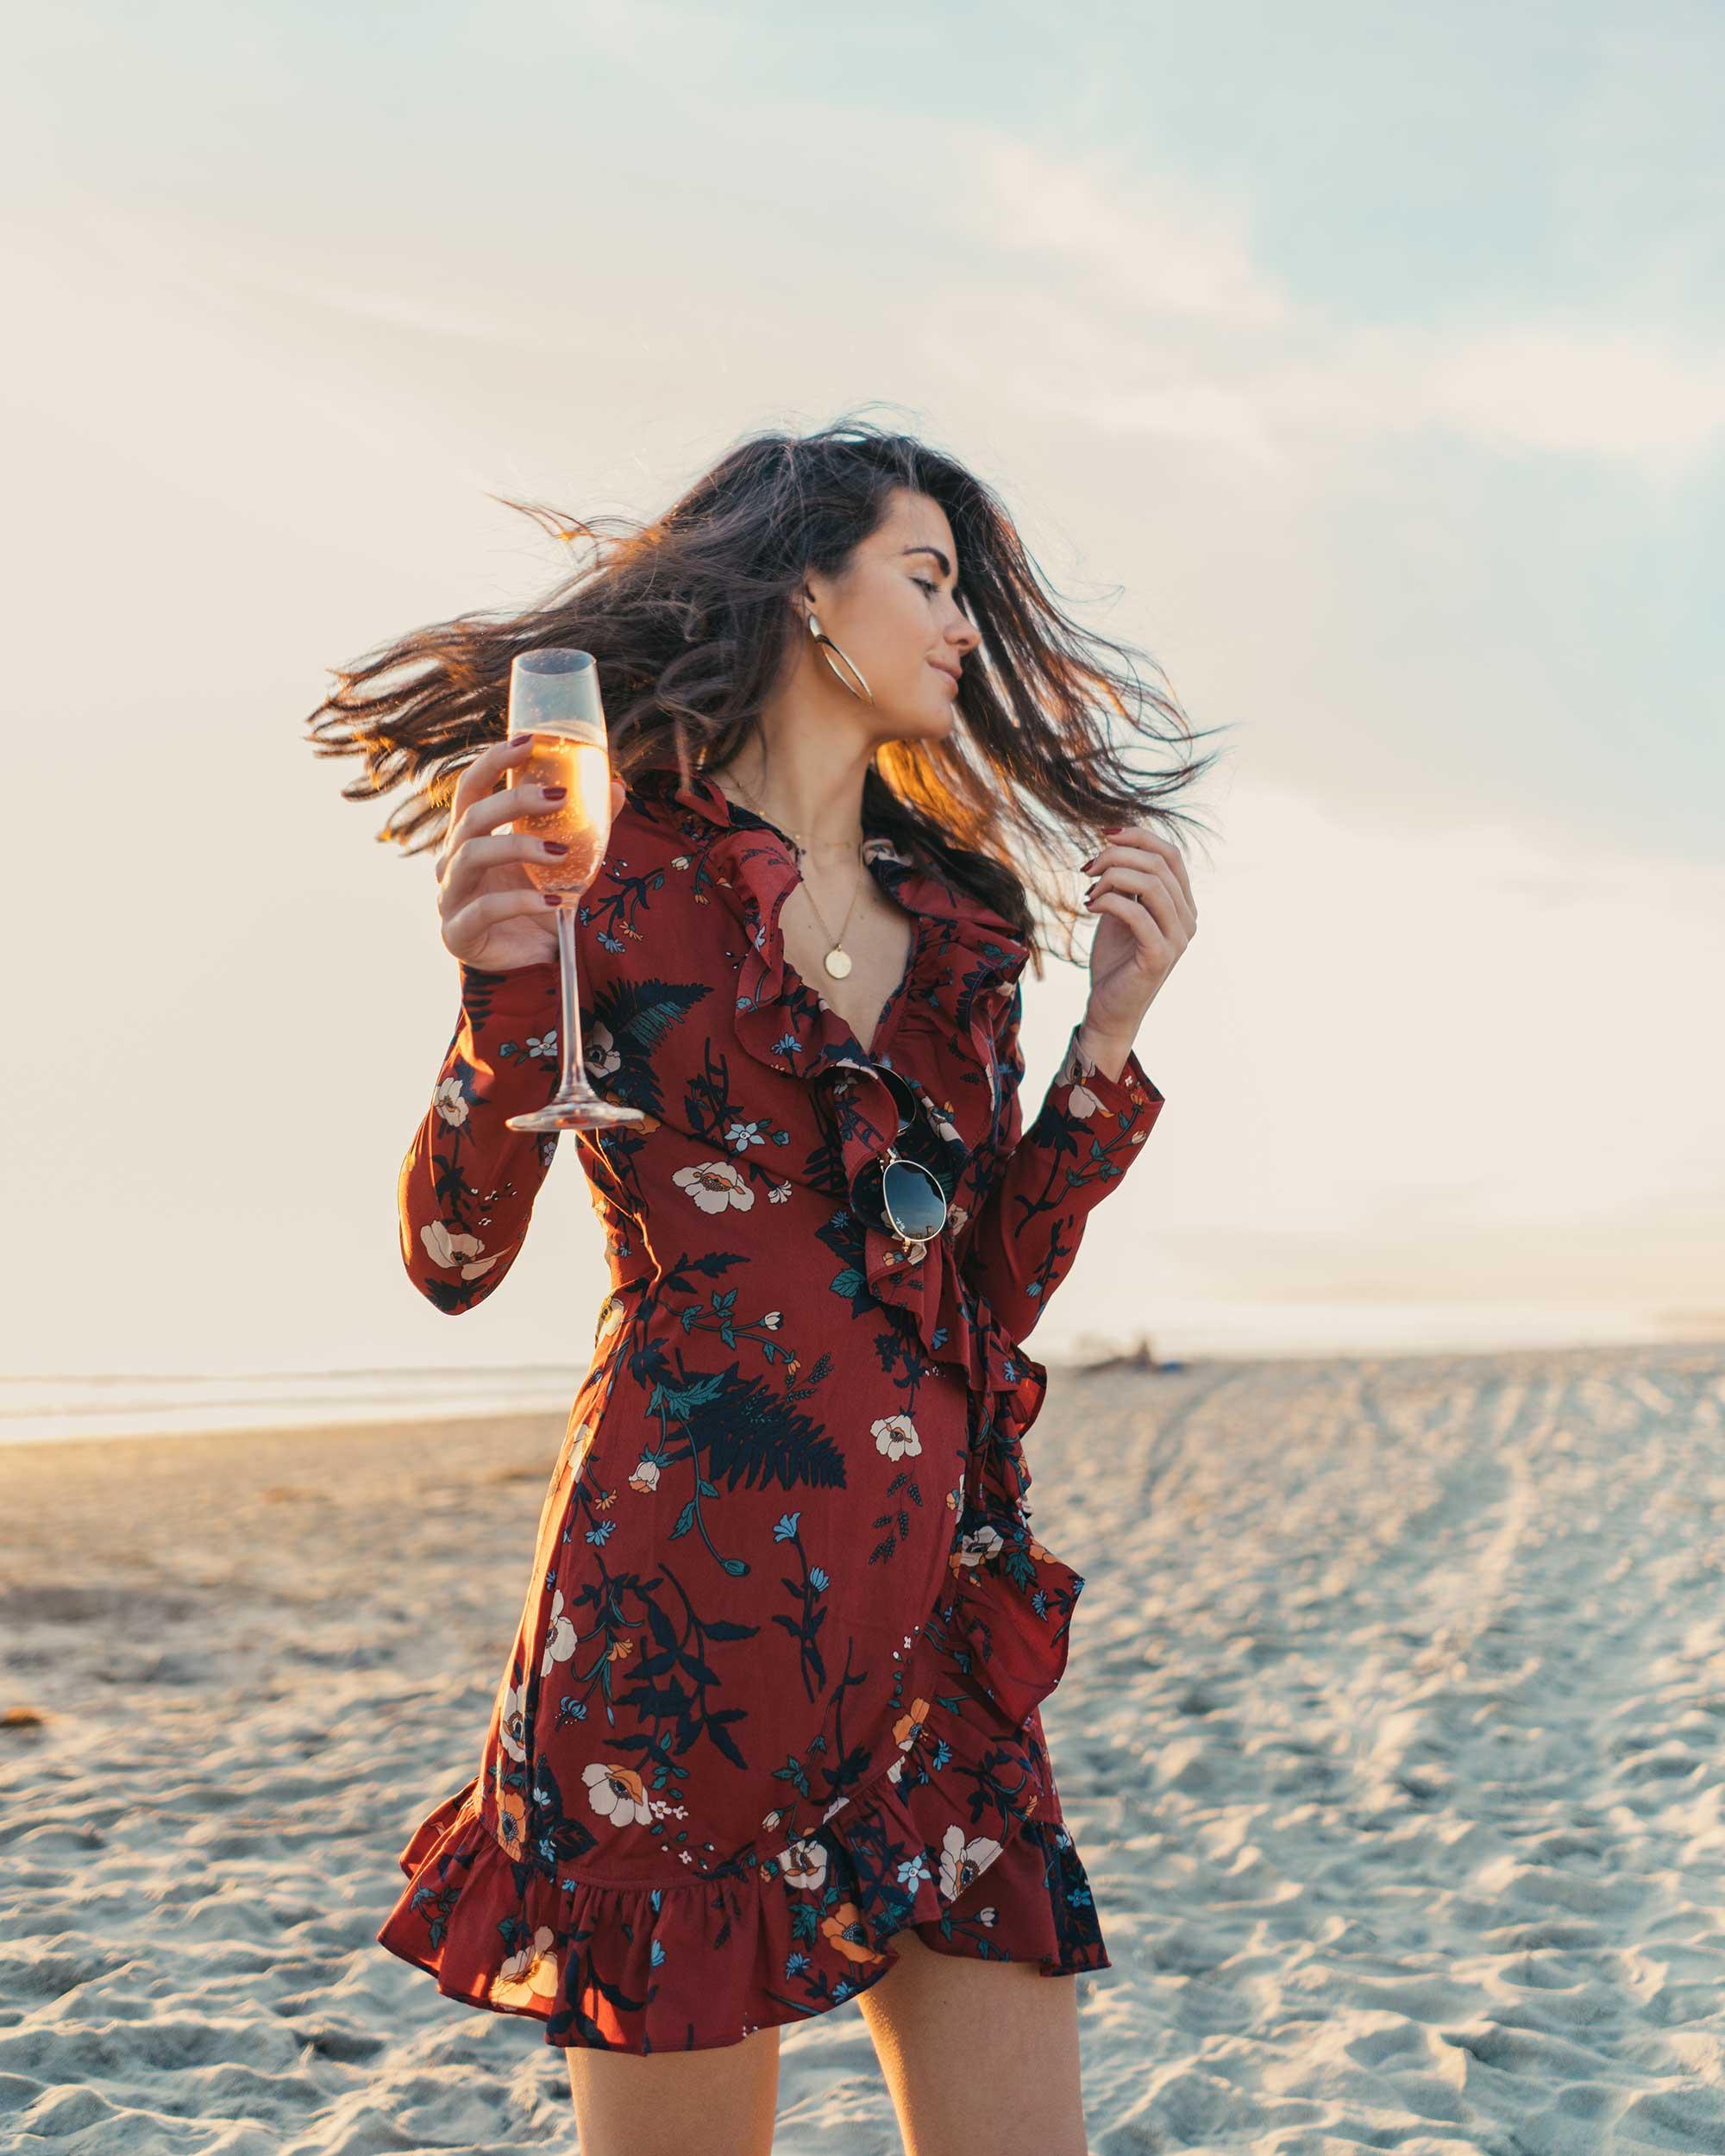 BURGUNDY-FLORAL-FRILL-WRAP-MINI-DRESS-Newport-Beach-California-Summer-Dress-4.jpg